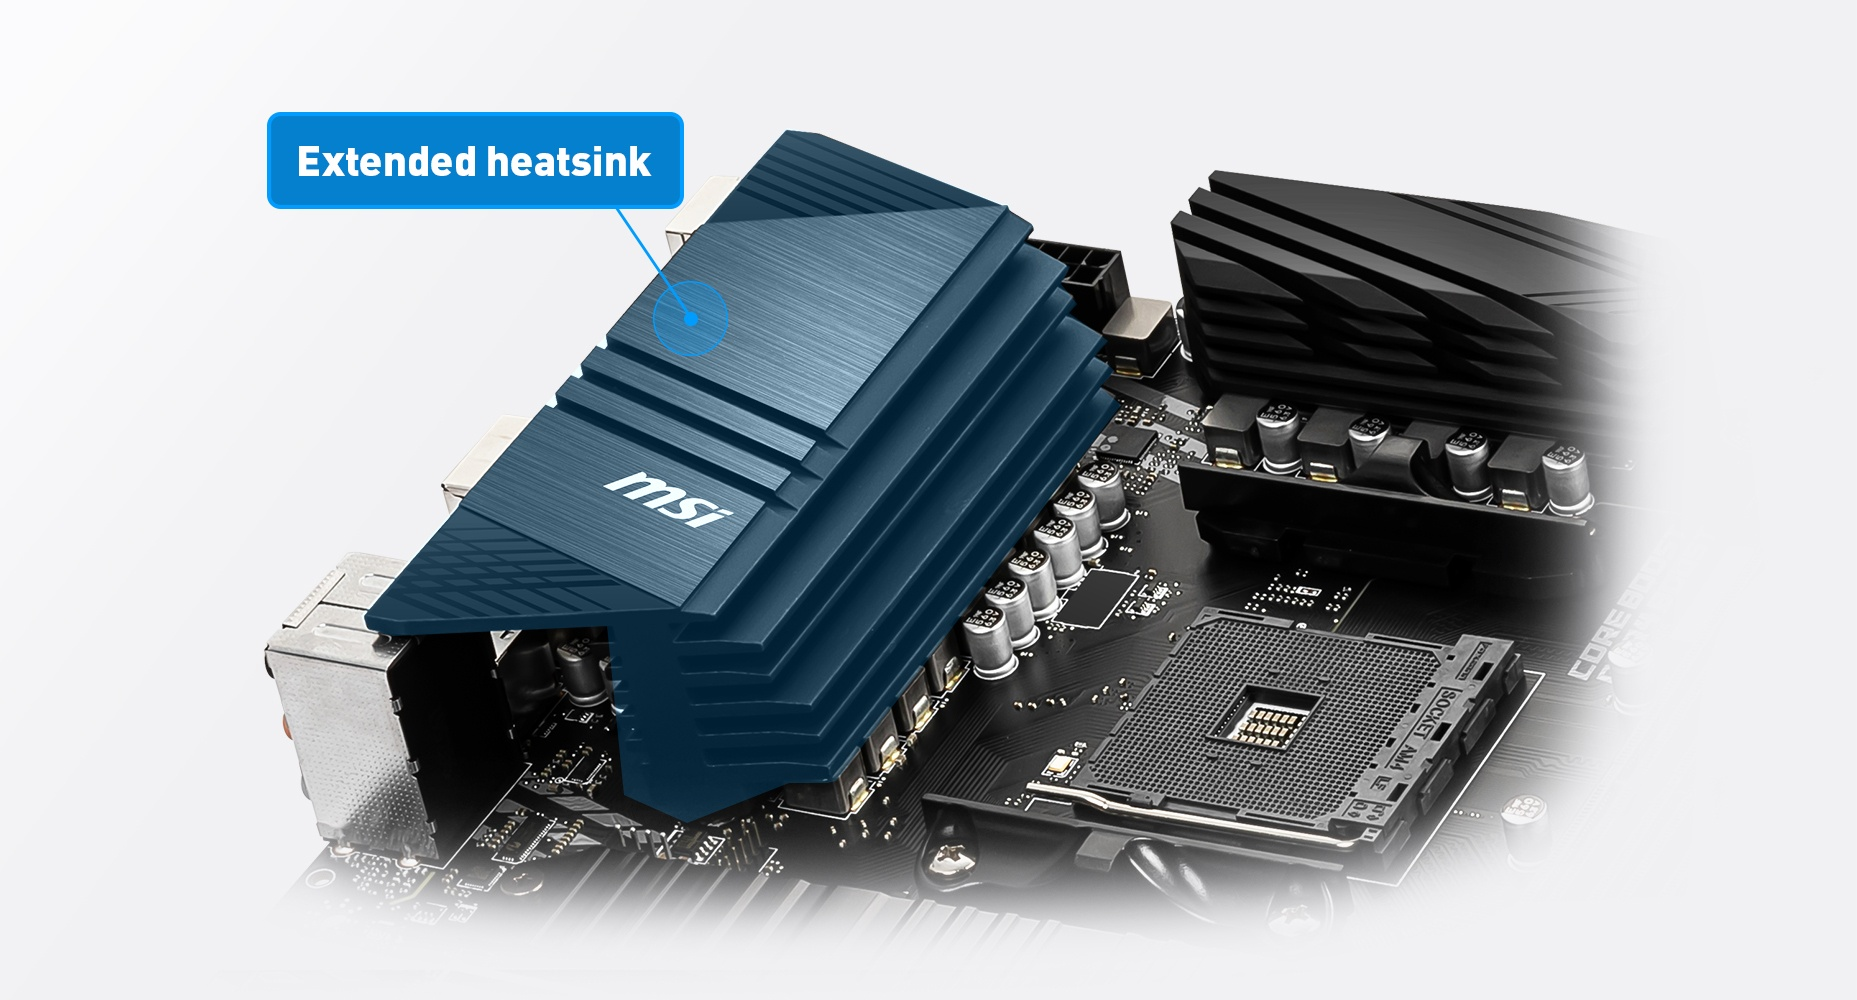 extedned  heatsink of the motherboard